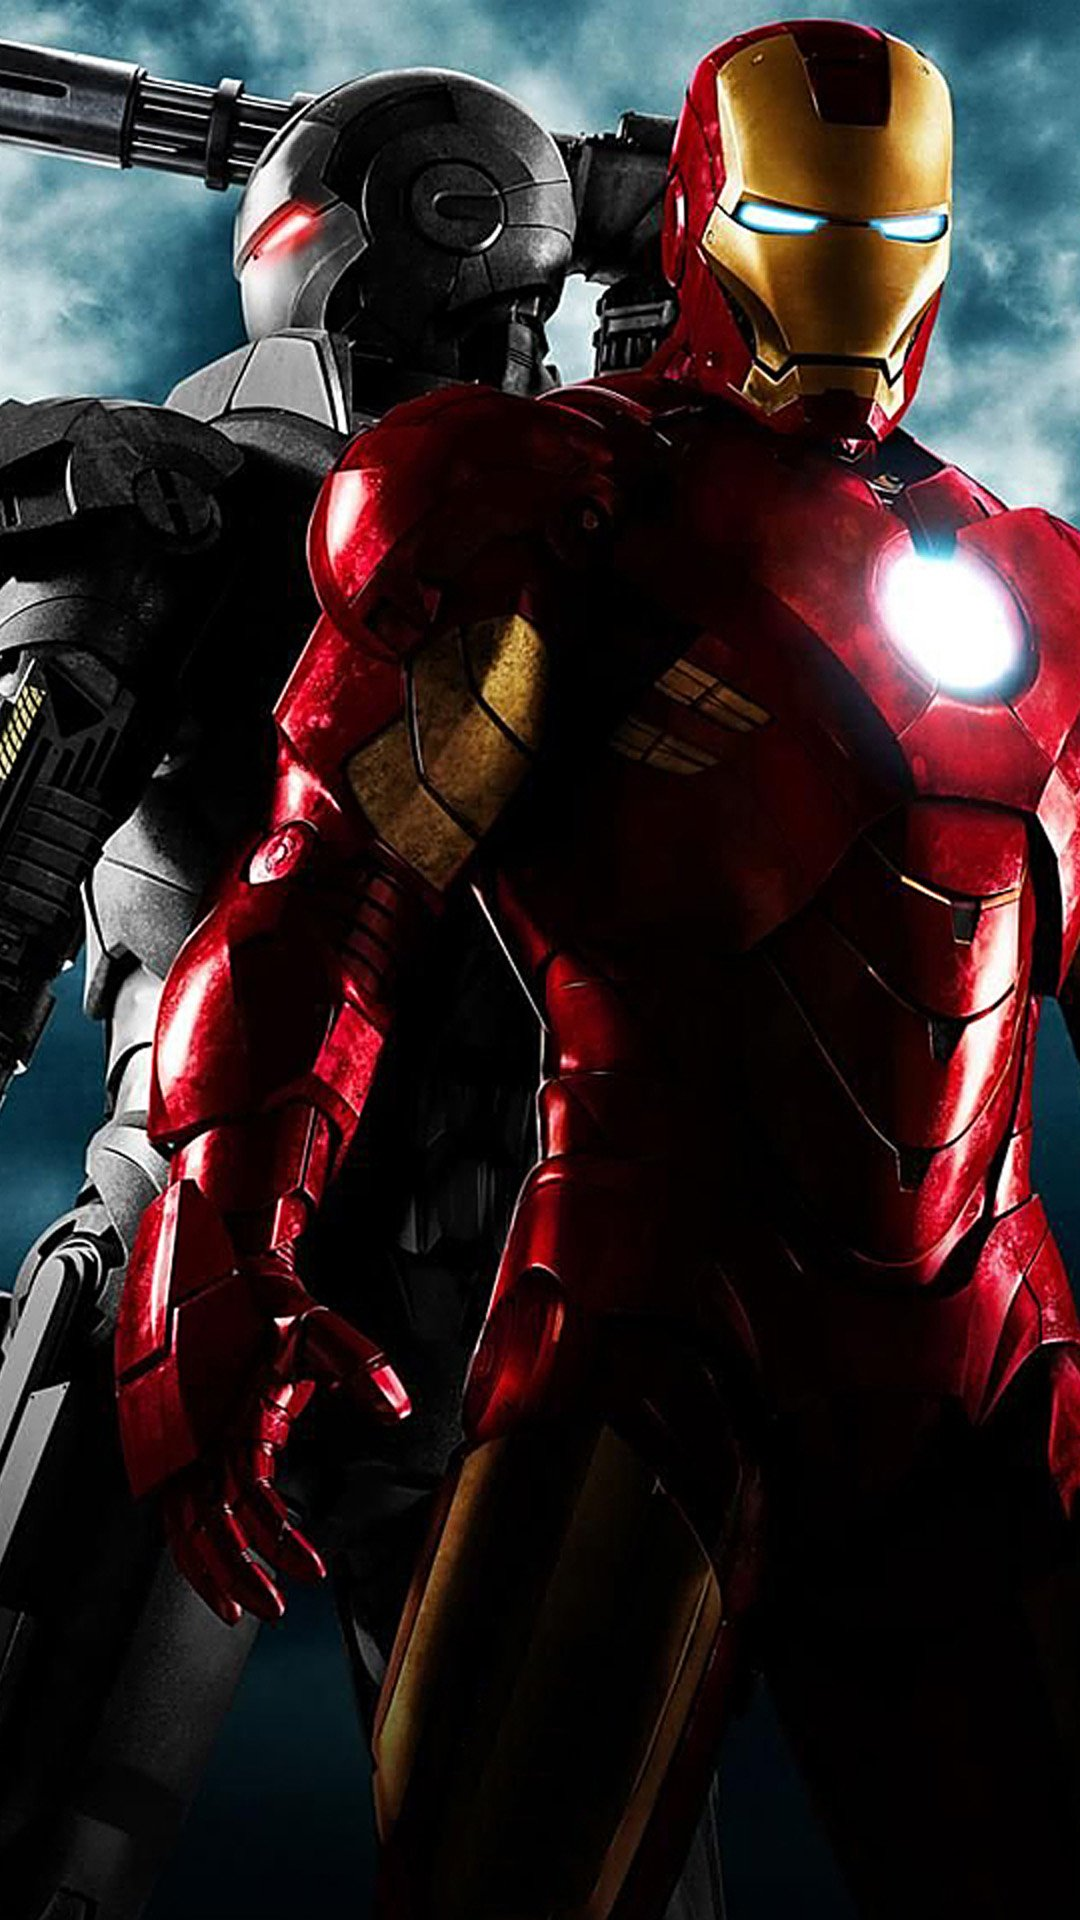 Iron Man Wallpaper for Android - WallpaperSafari